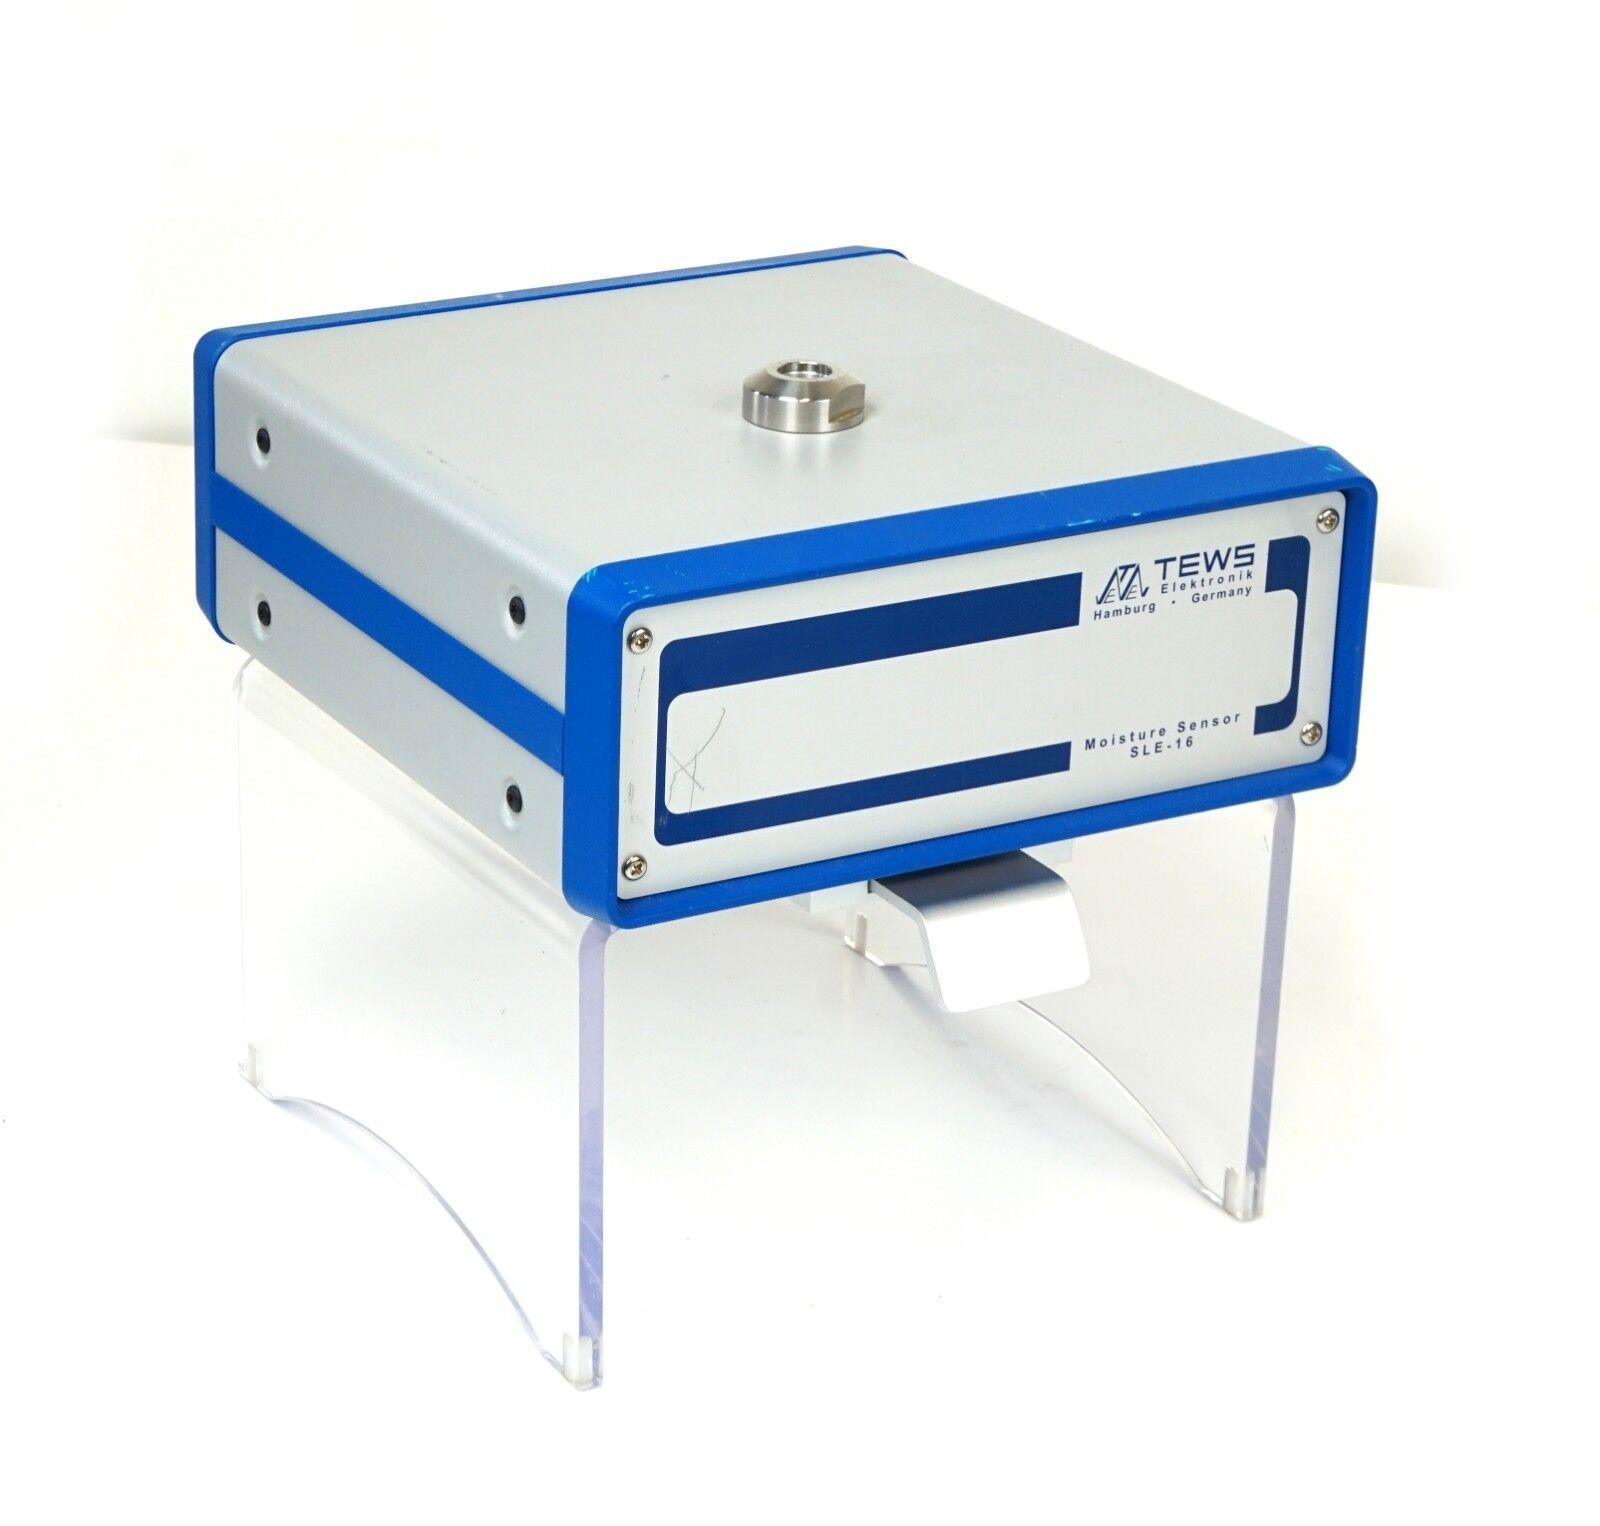 Tews Microwave Sensor